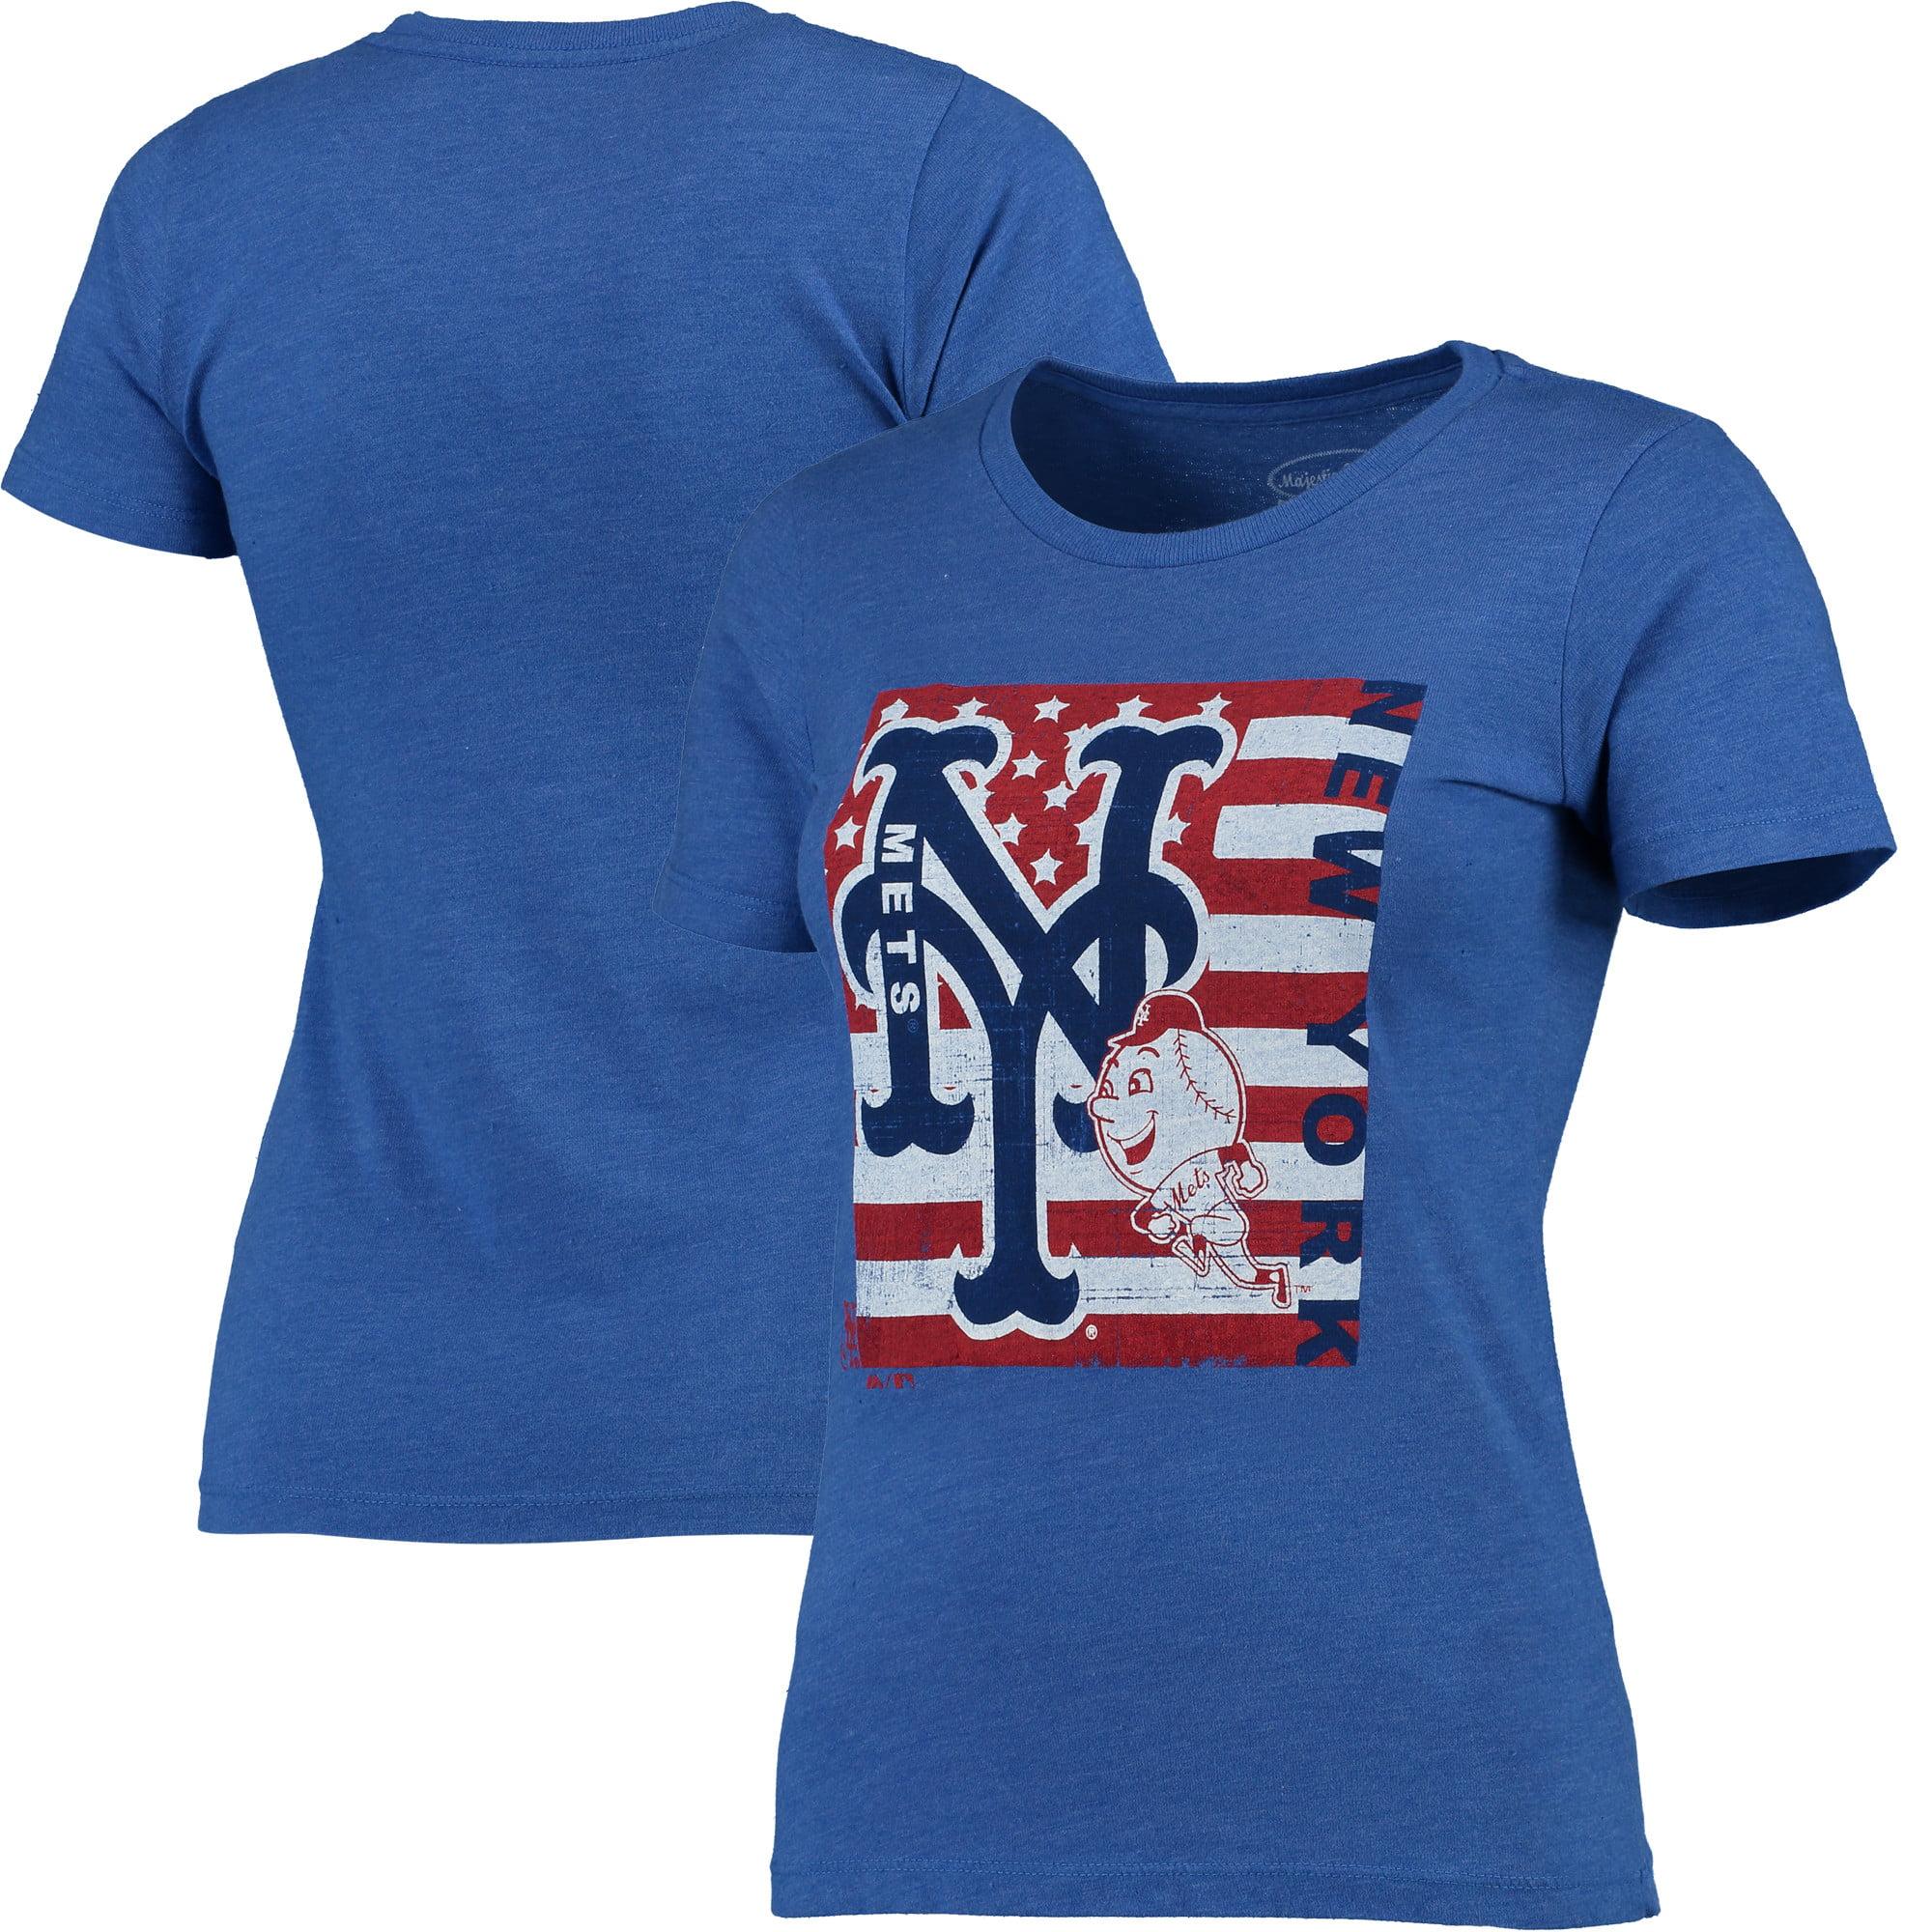 New York Mets Majestic Threads Women's Stars & Stripes Flag T-Shirt - Royal